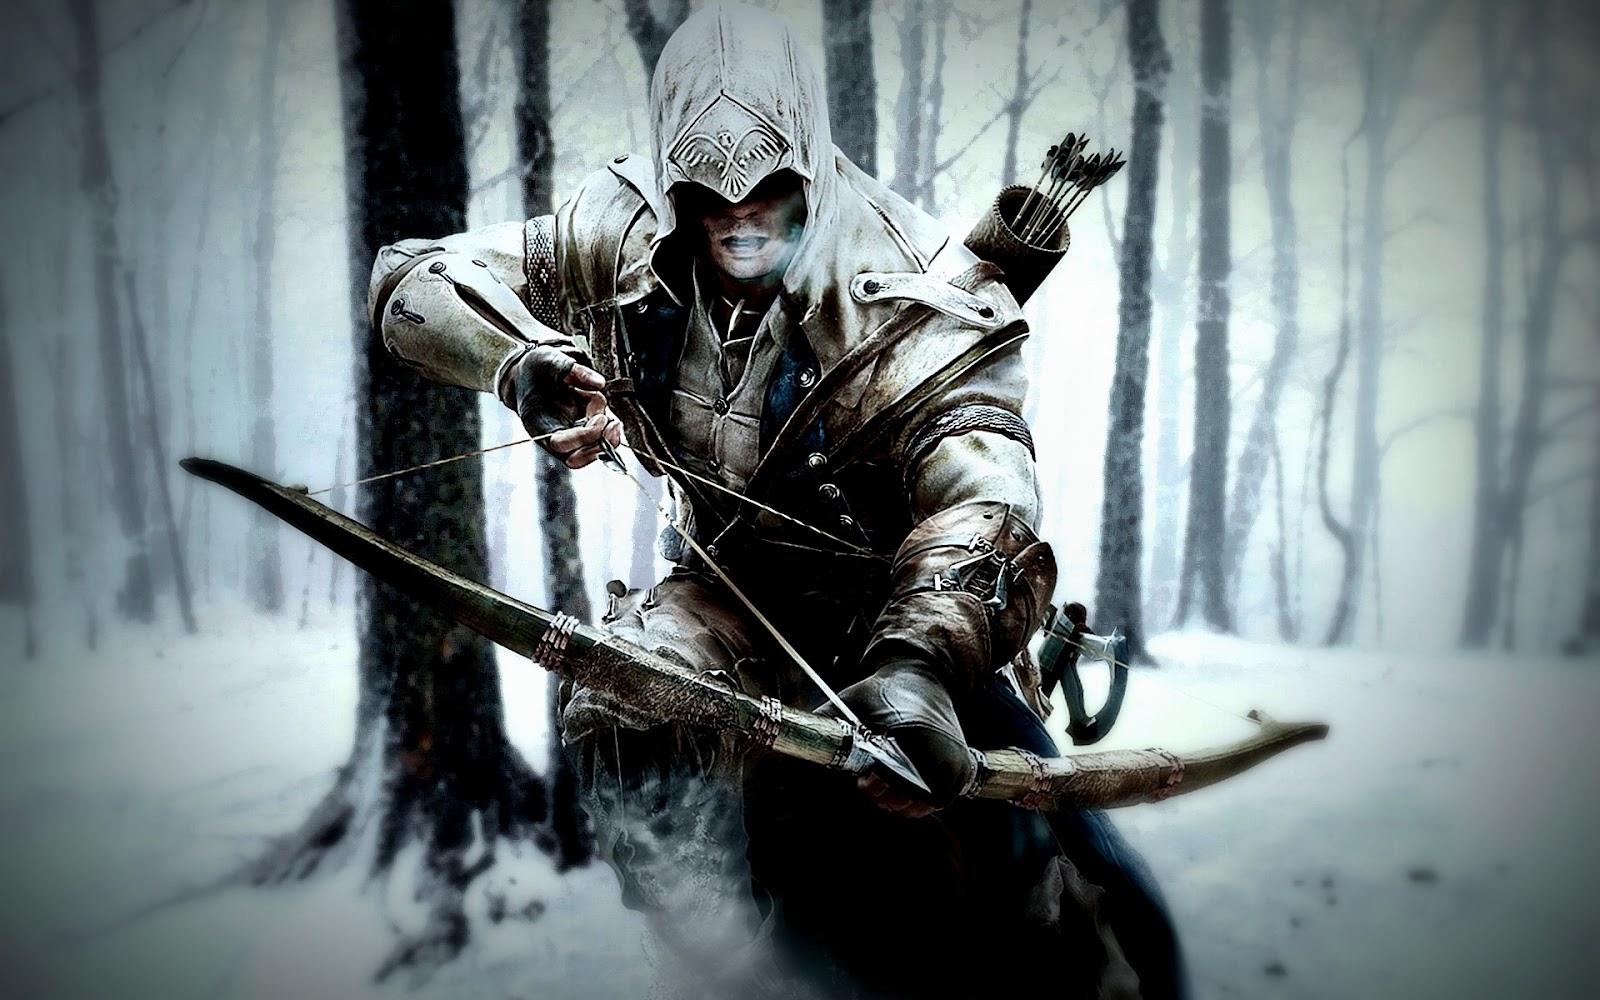 Wallpaper Hd Assassins Creed Sf Wallpaper